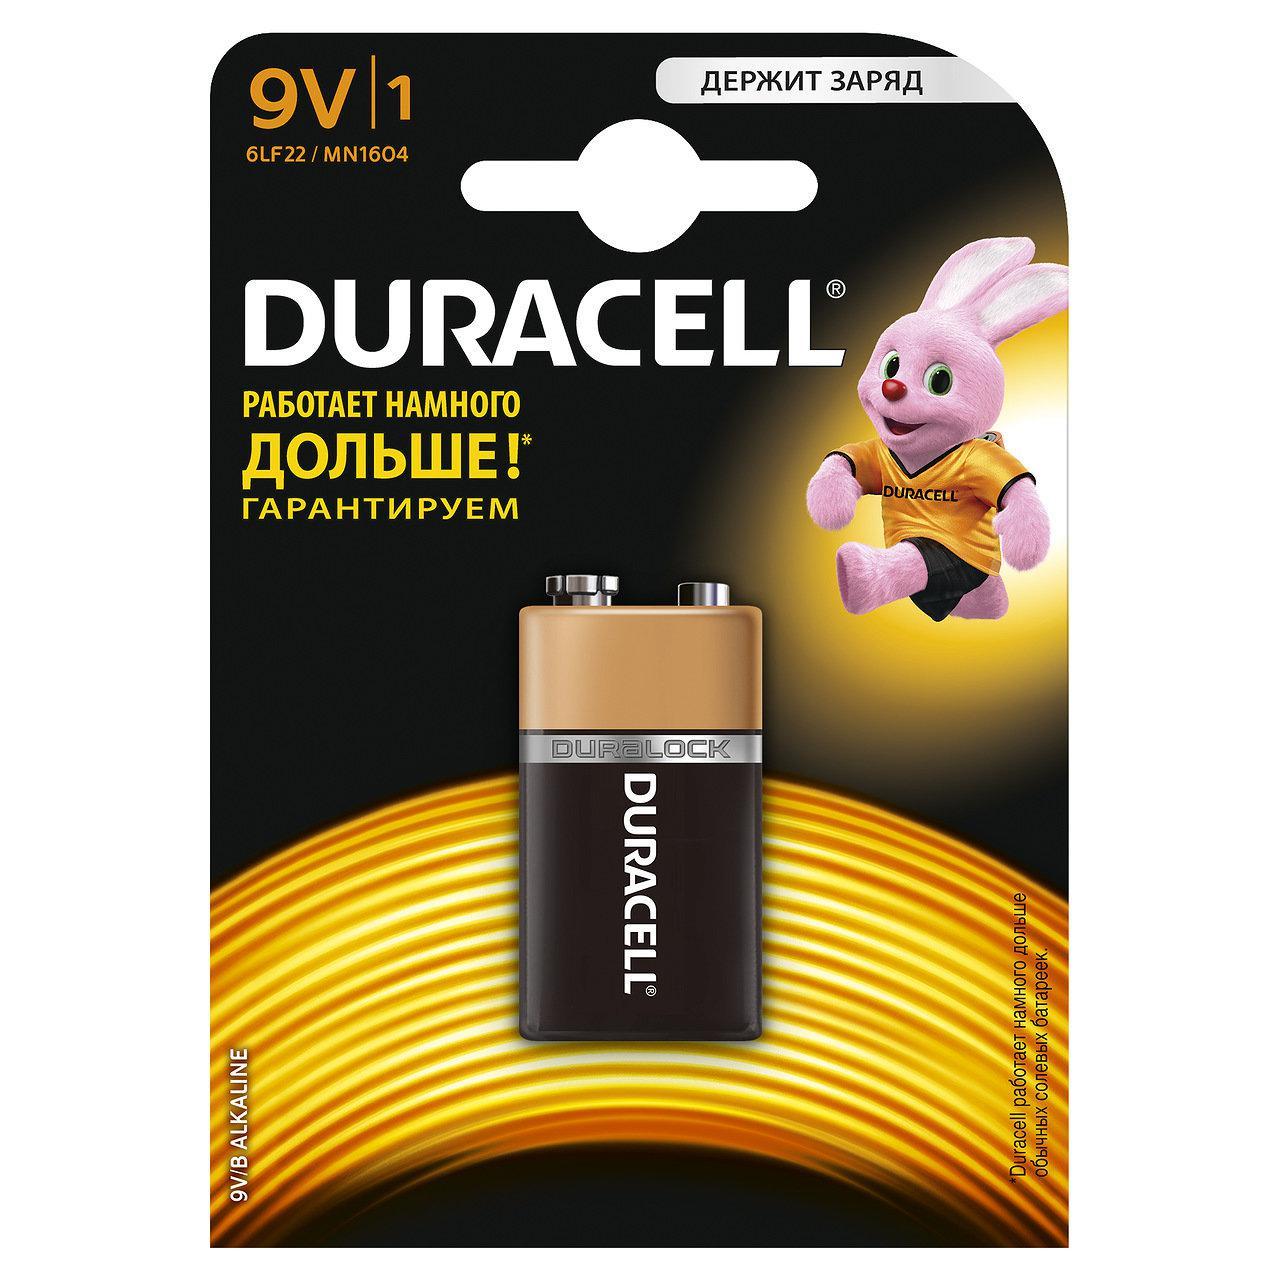 Батарейка Duracell 6lr61 (6lf22) bp1 9В 1шт. (крона) Тип: крона 6f22(9v) (Кол-во в уп. 1шт.) фото